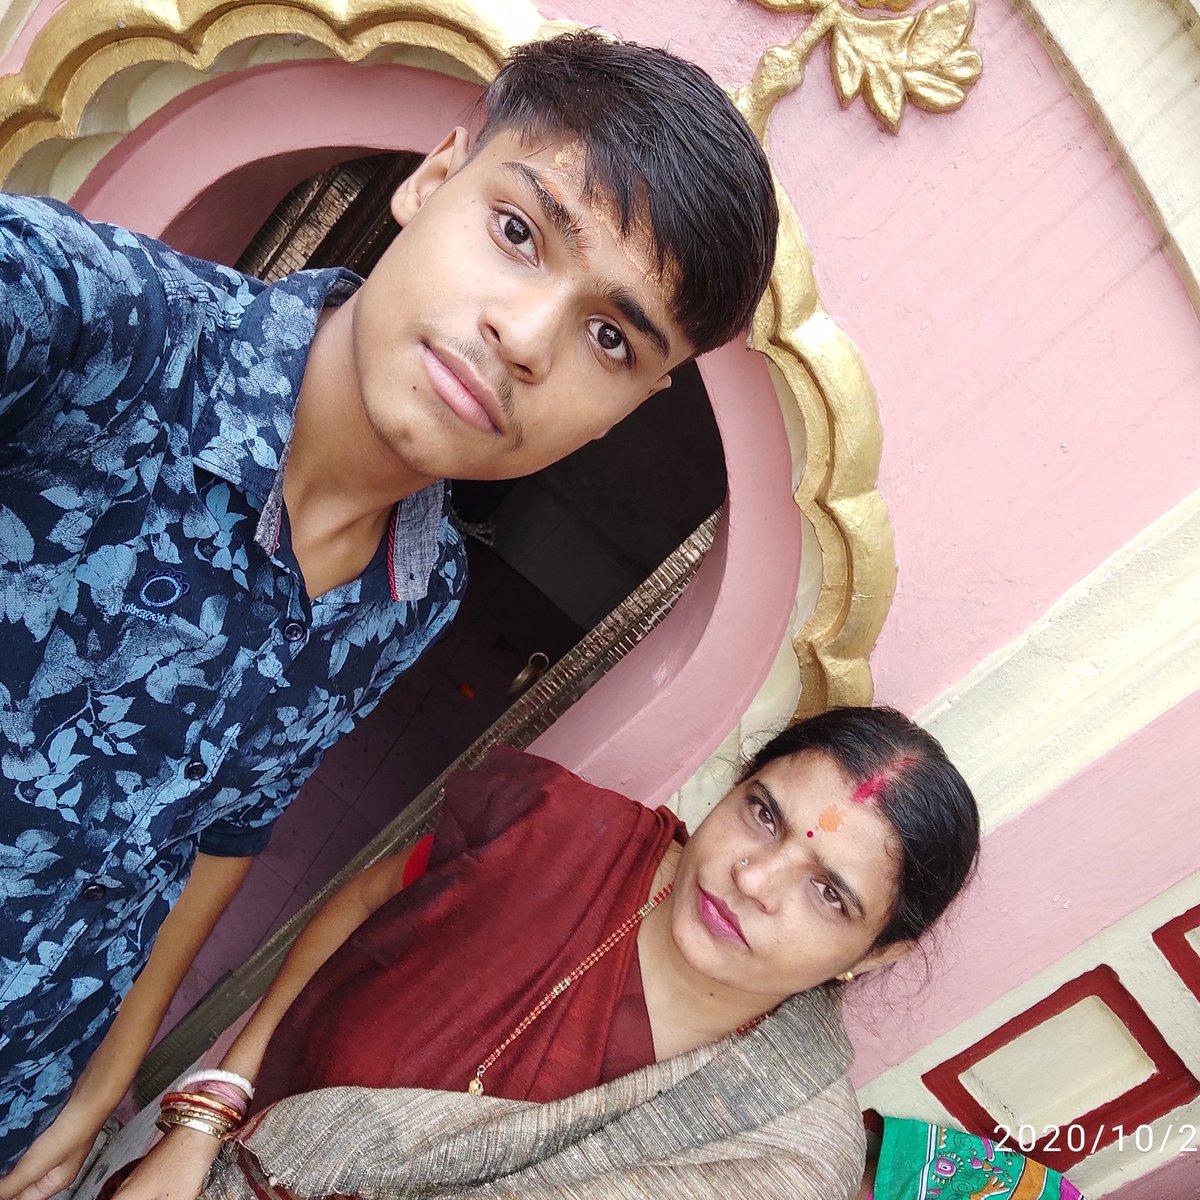 Me & my mom...Today we have come to meet the Mahadev....     #harharmahadevॐ https://t.co/bNtwhWav8q